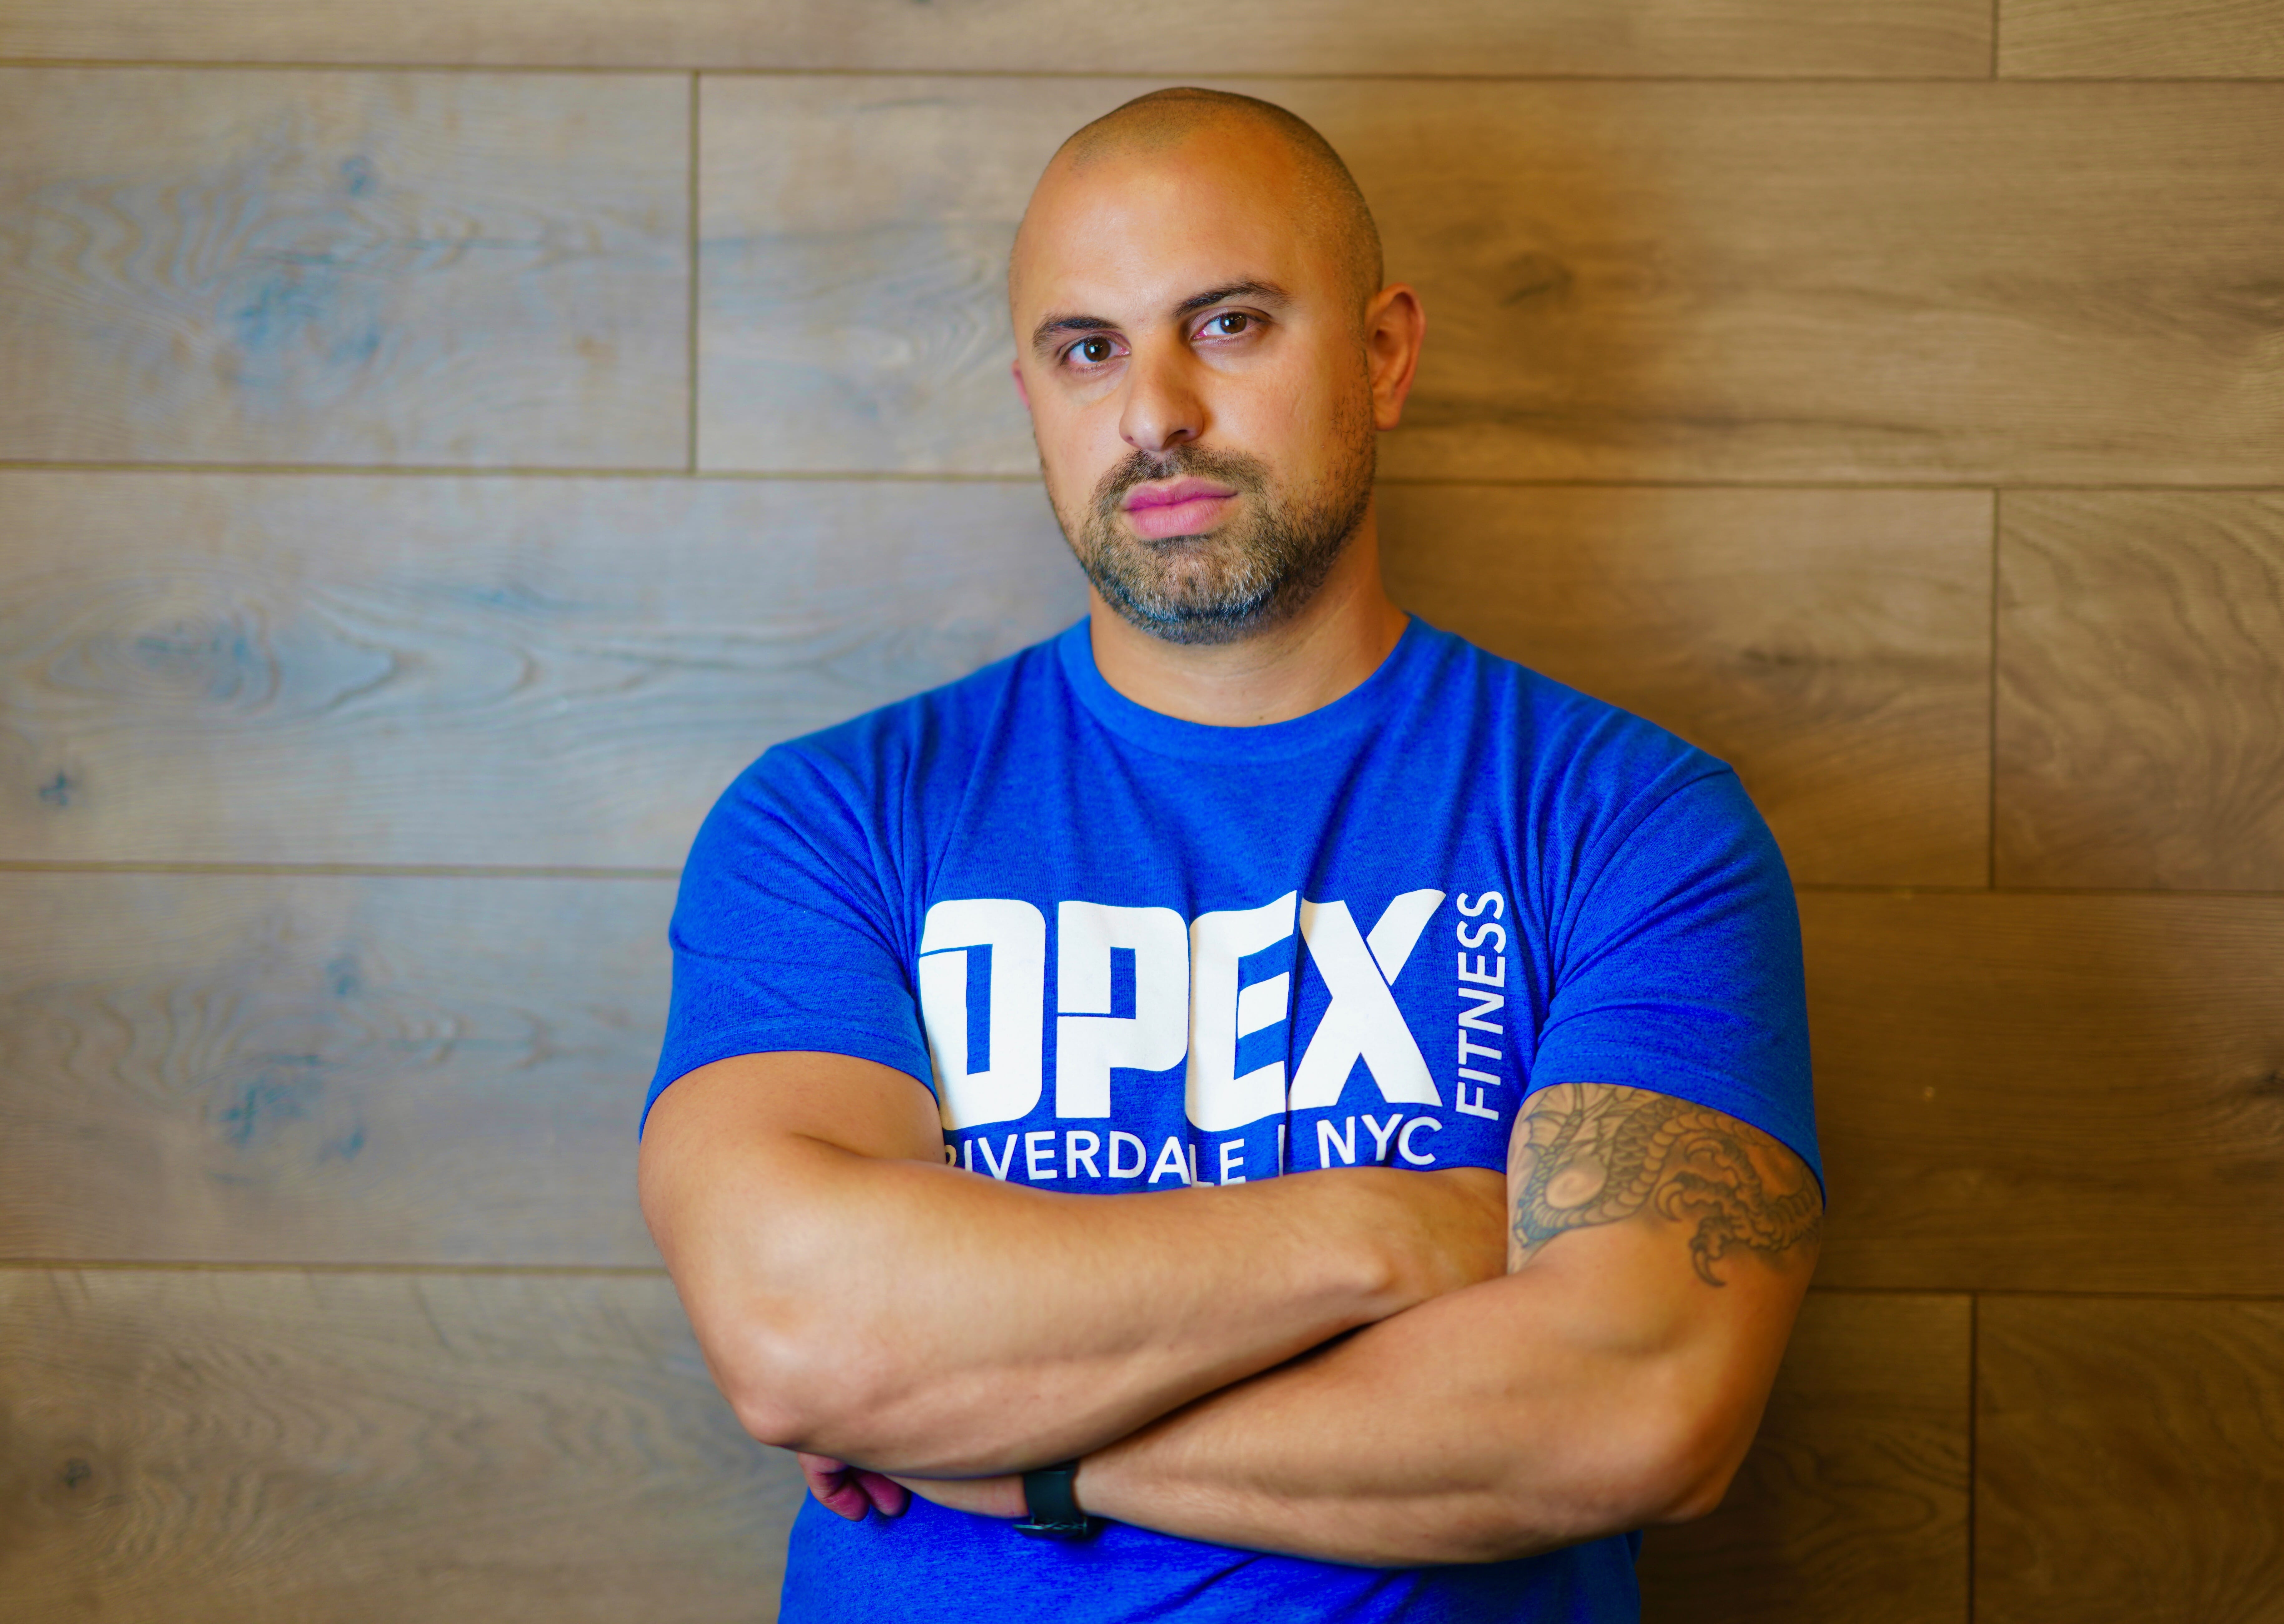 OPEX Riverdale | John Tracey